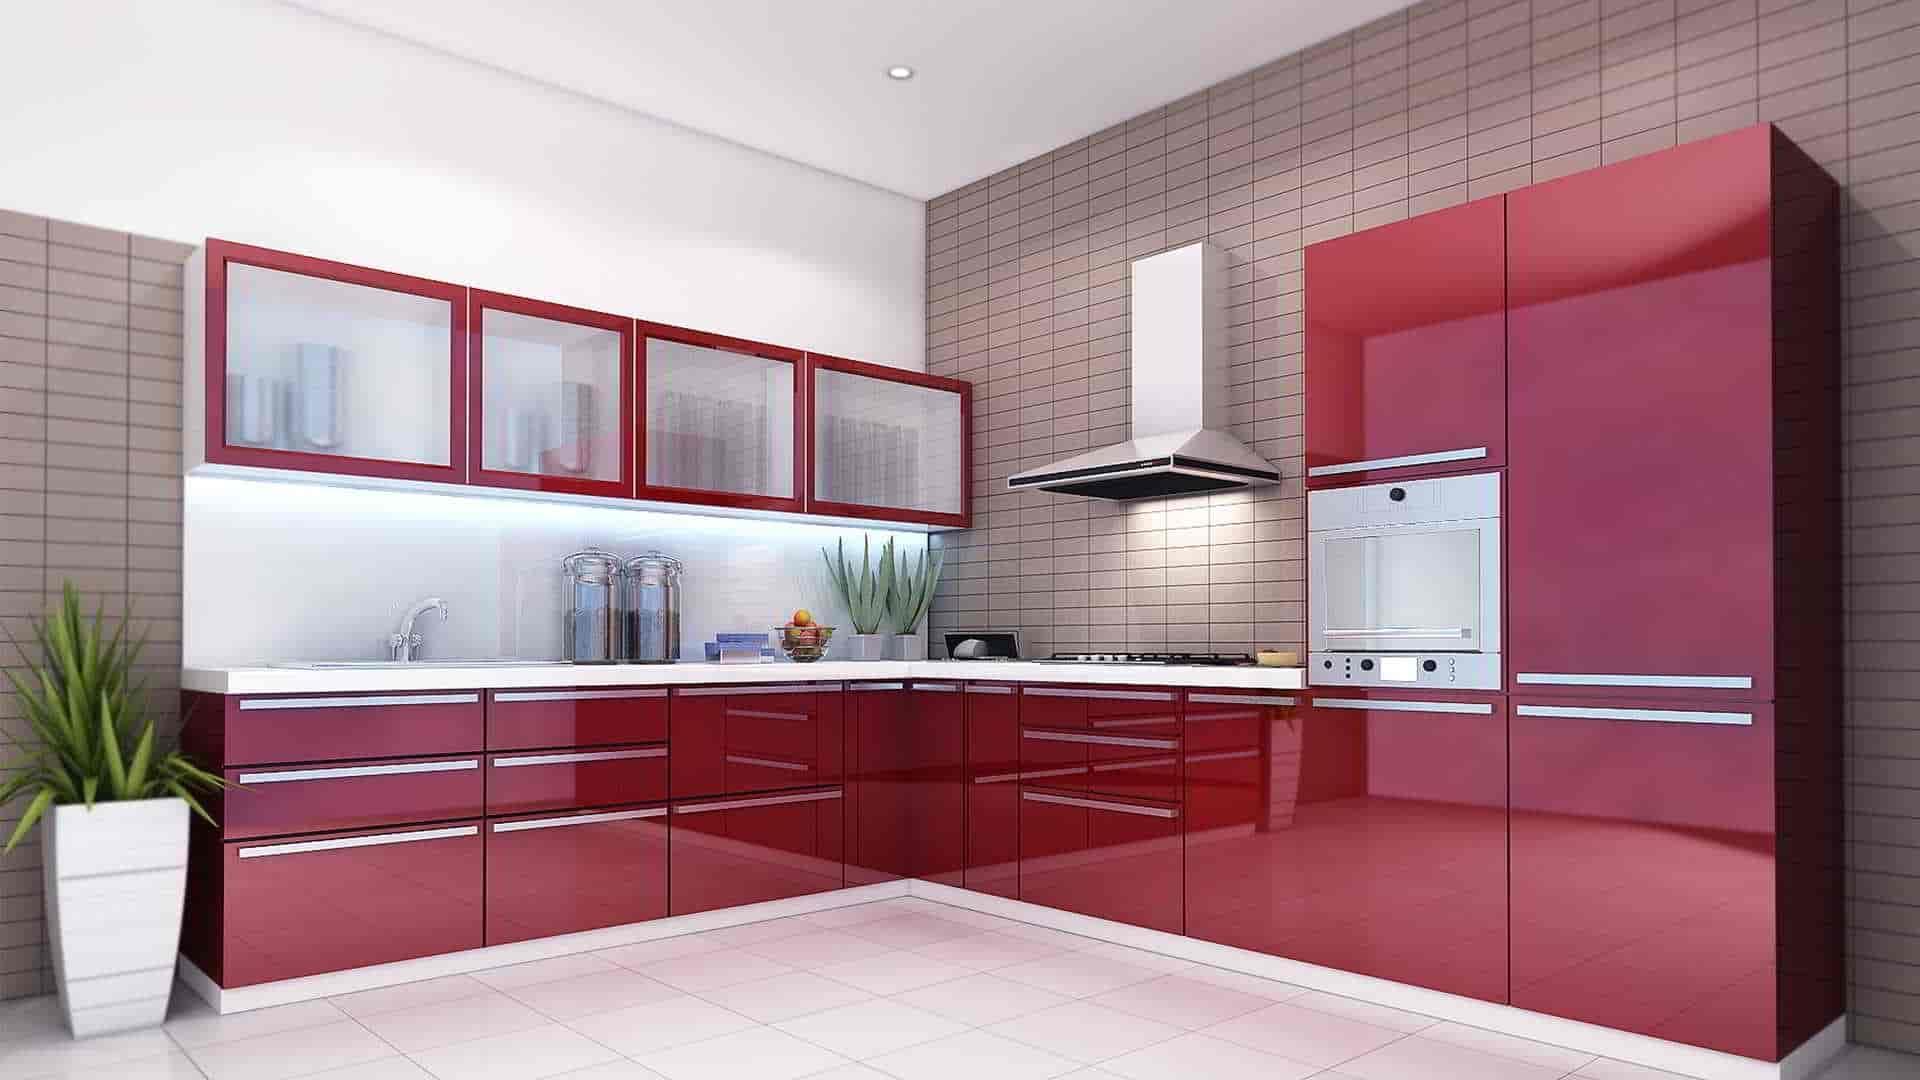 Eazy Modular Kitchen And Interior Designers Rs Puram Interior